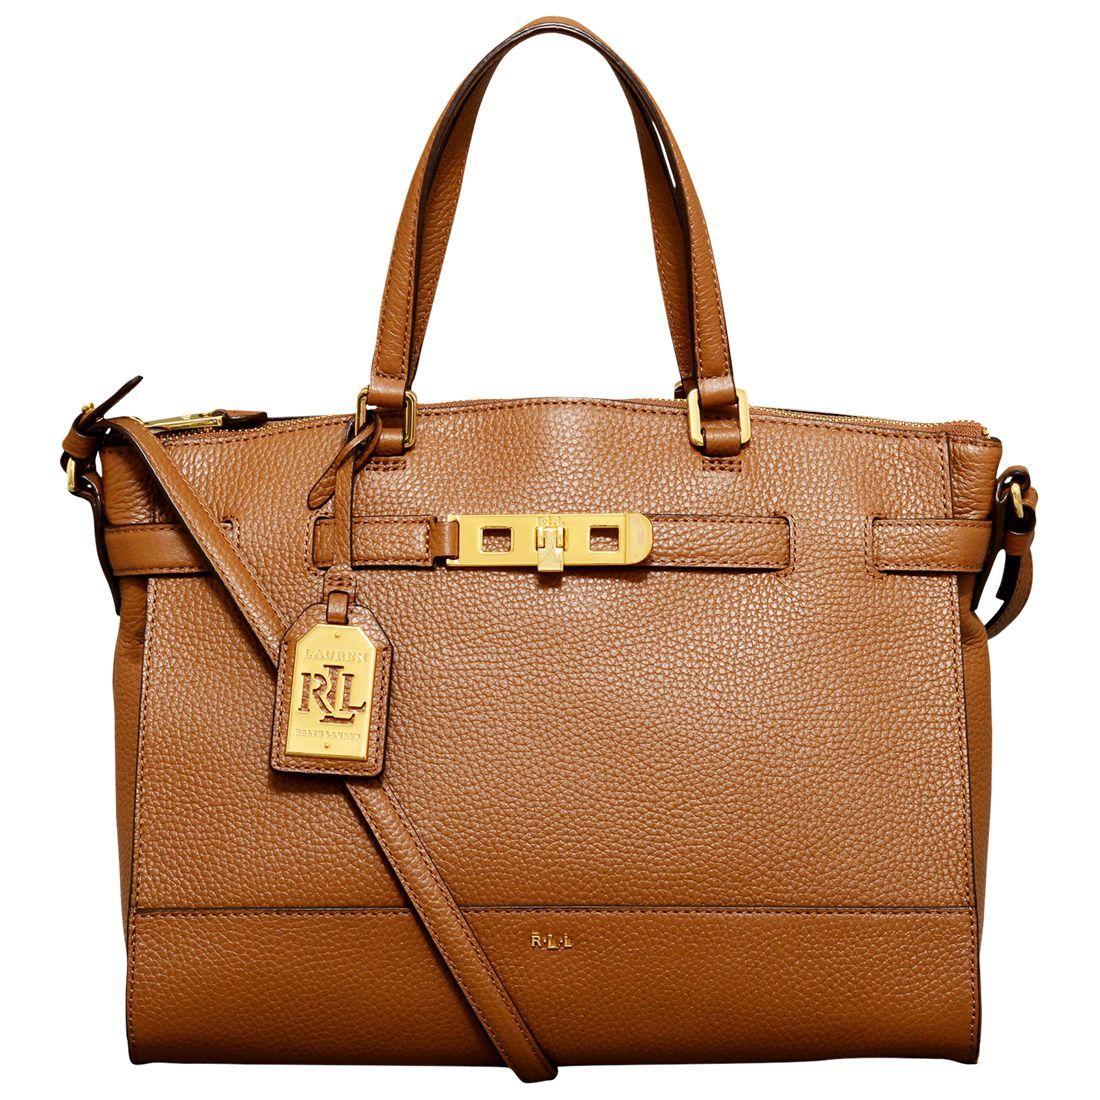 5ad415d2cb6dd Ralph Lauren Darwin Bridle Satchel Handbag